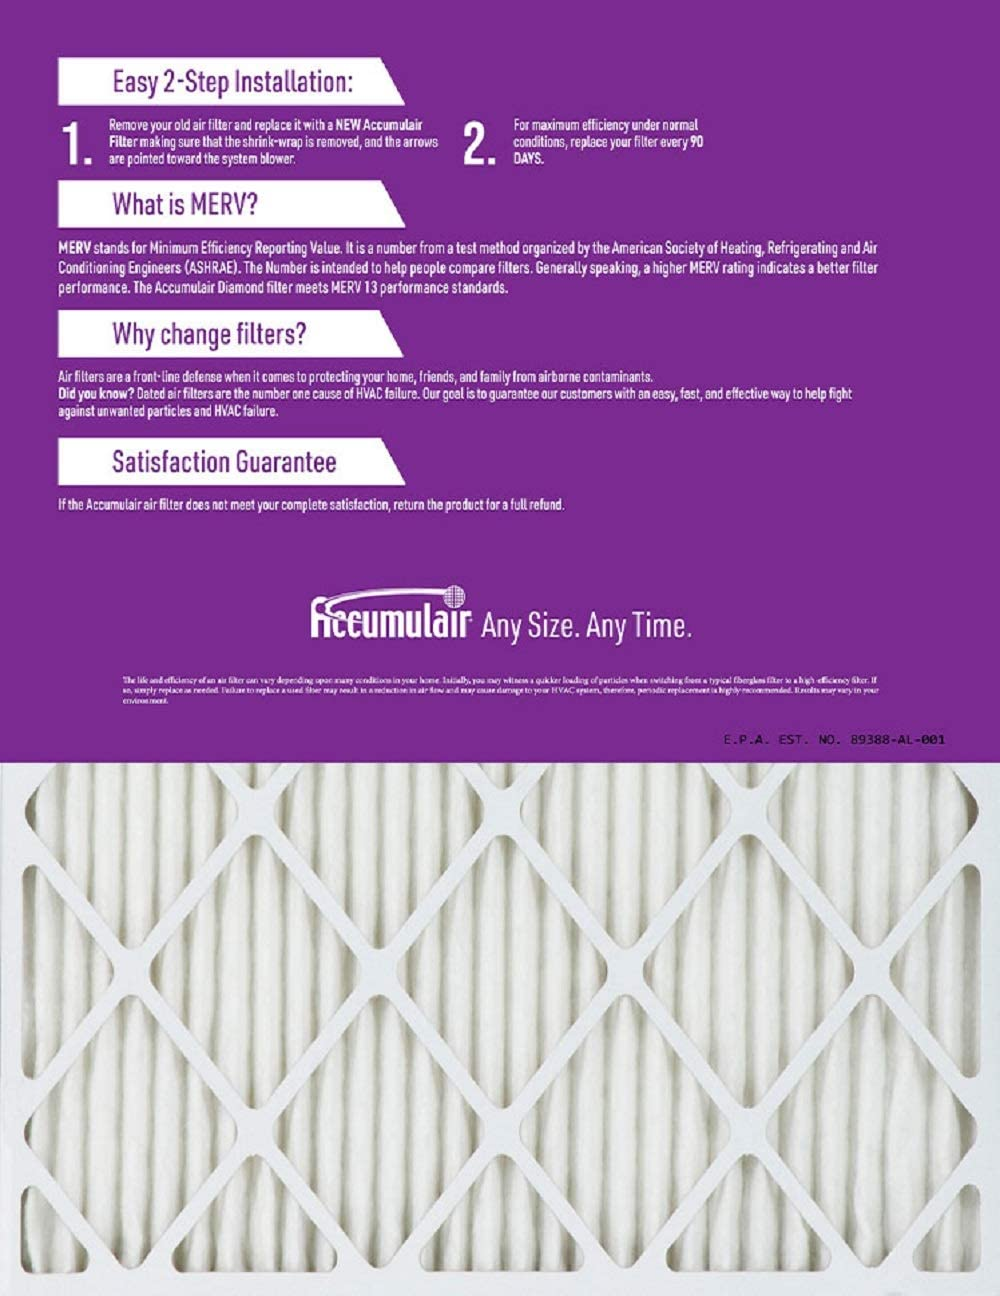 Actual Size Accumulair Diamond 6.88x15.88x1 MERV 13 Air Filter//Furnace Filters 2 Pack